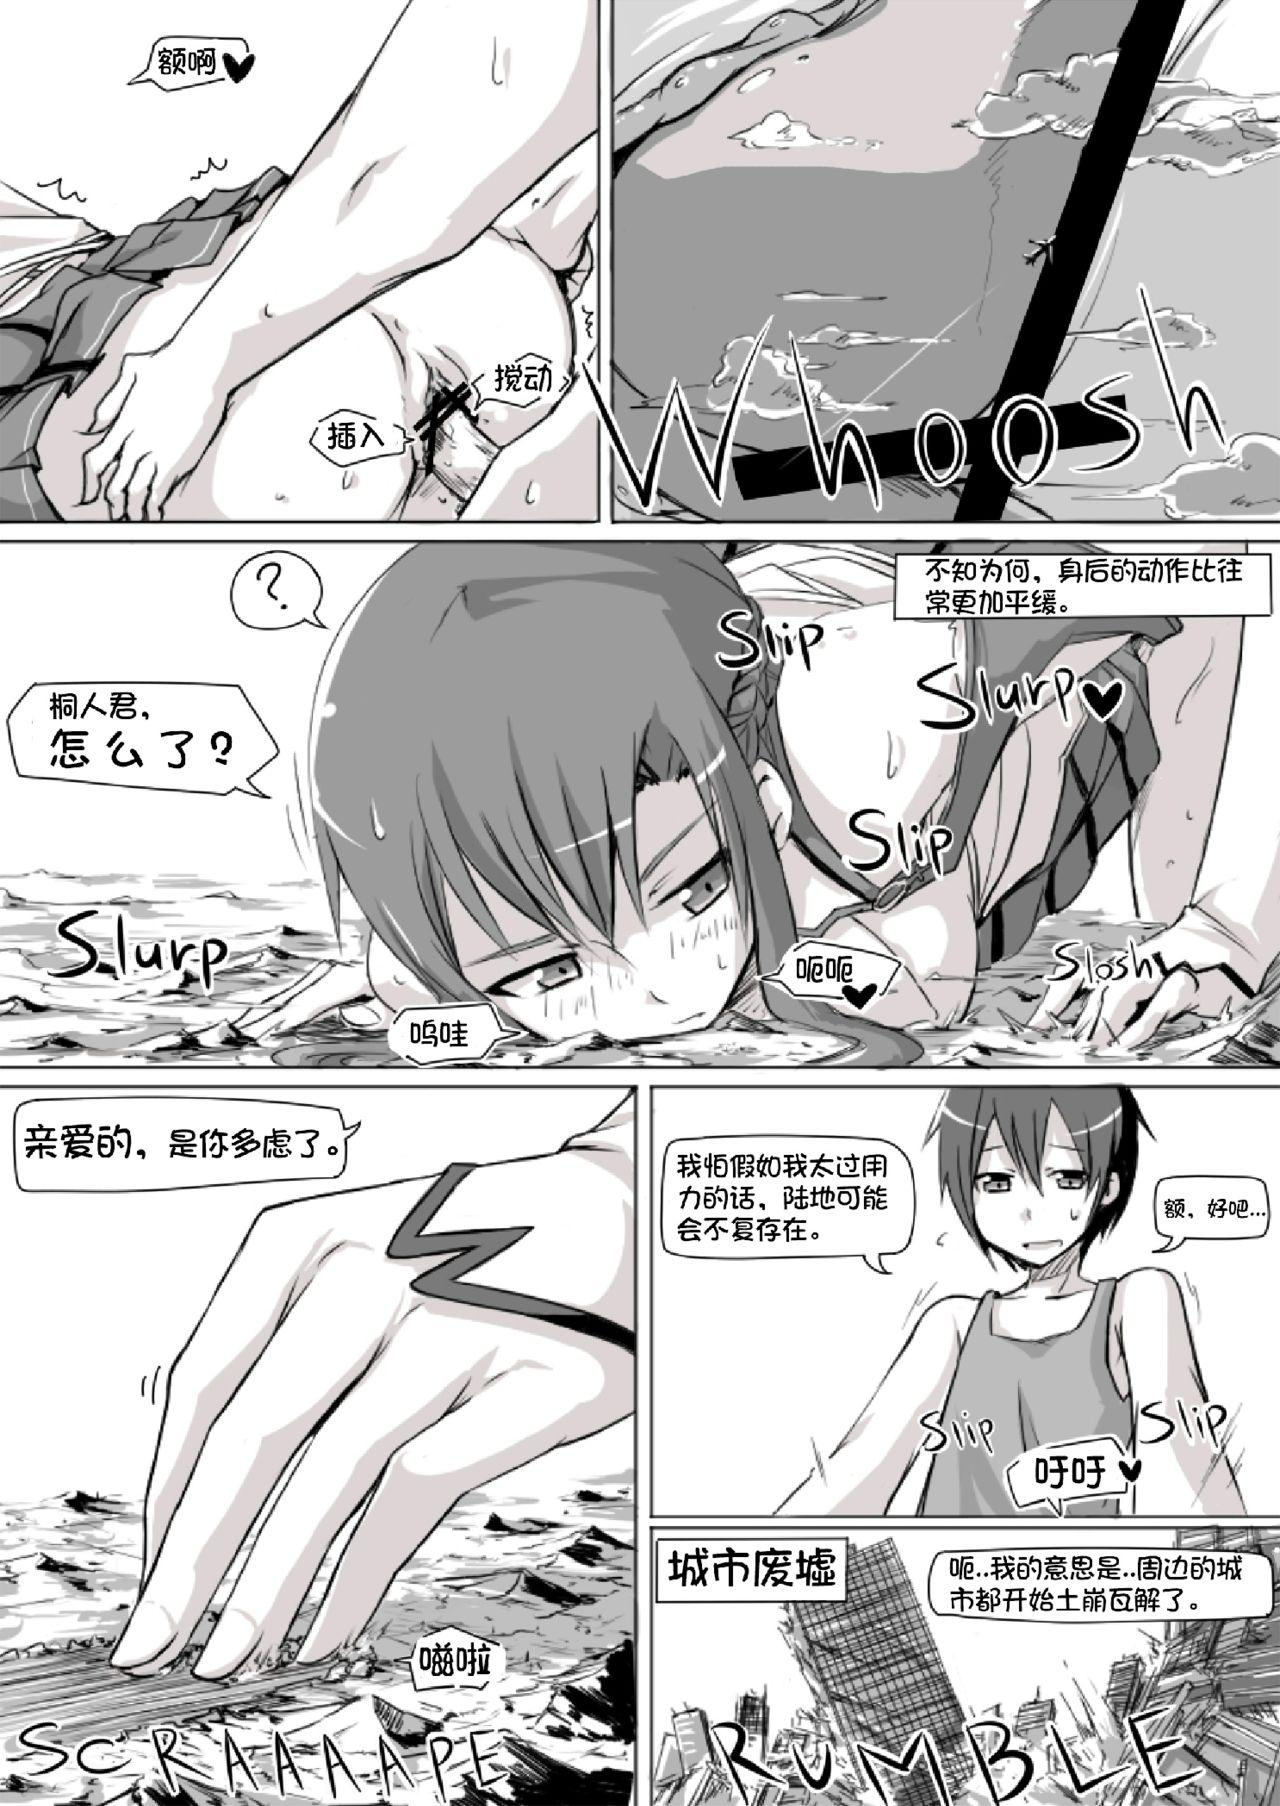 Size Henkou de Asuna ga Yaritai Houdai Online | 体型变化任性的亚丝娜网络游戏 3